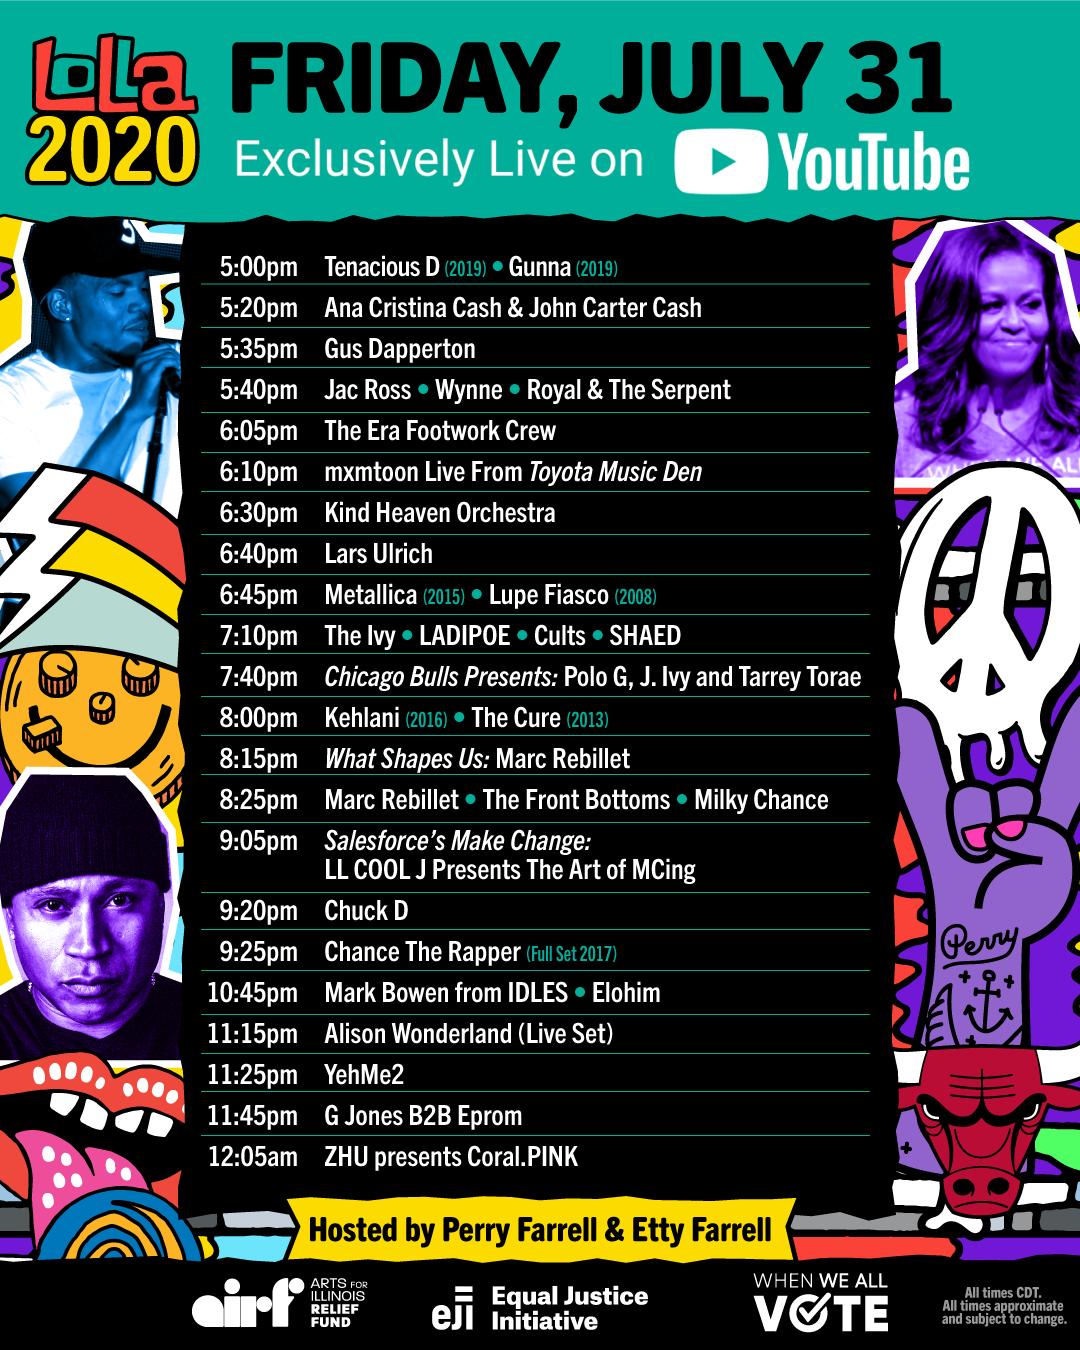 Lollapalooza 2020 Friday